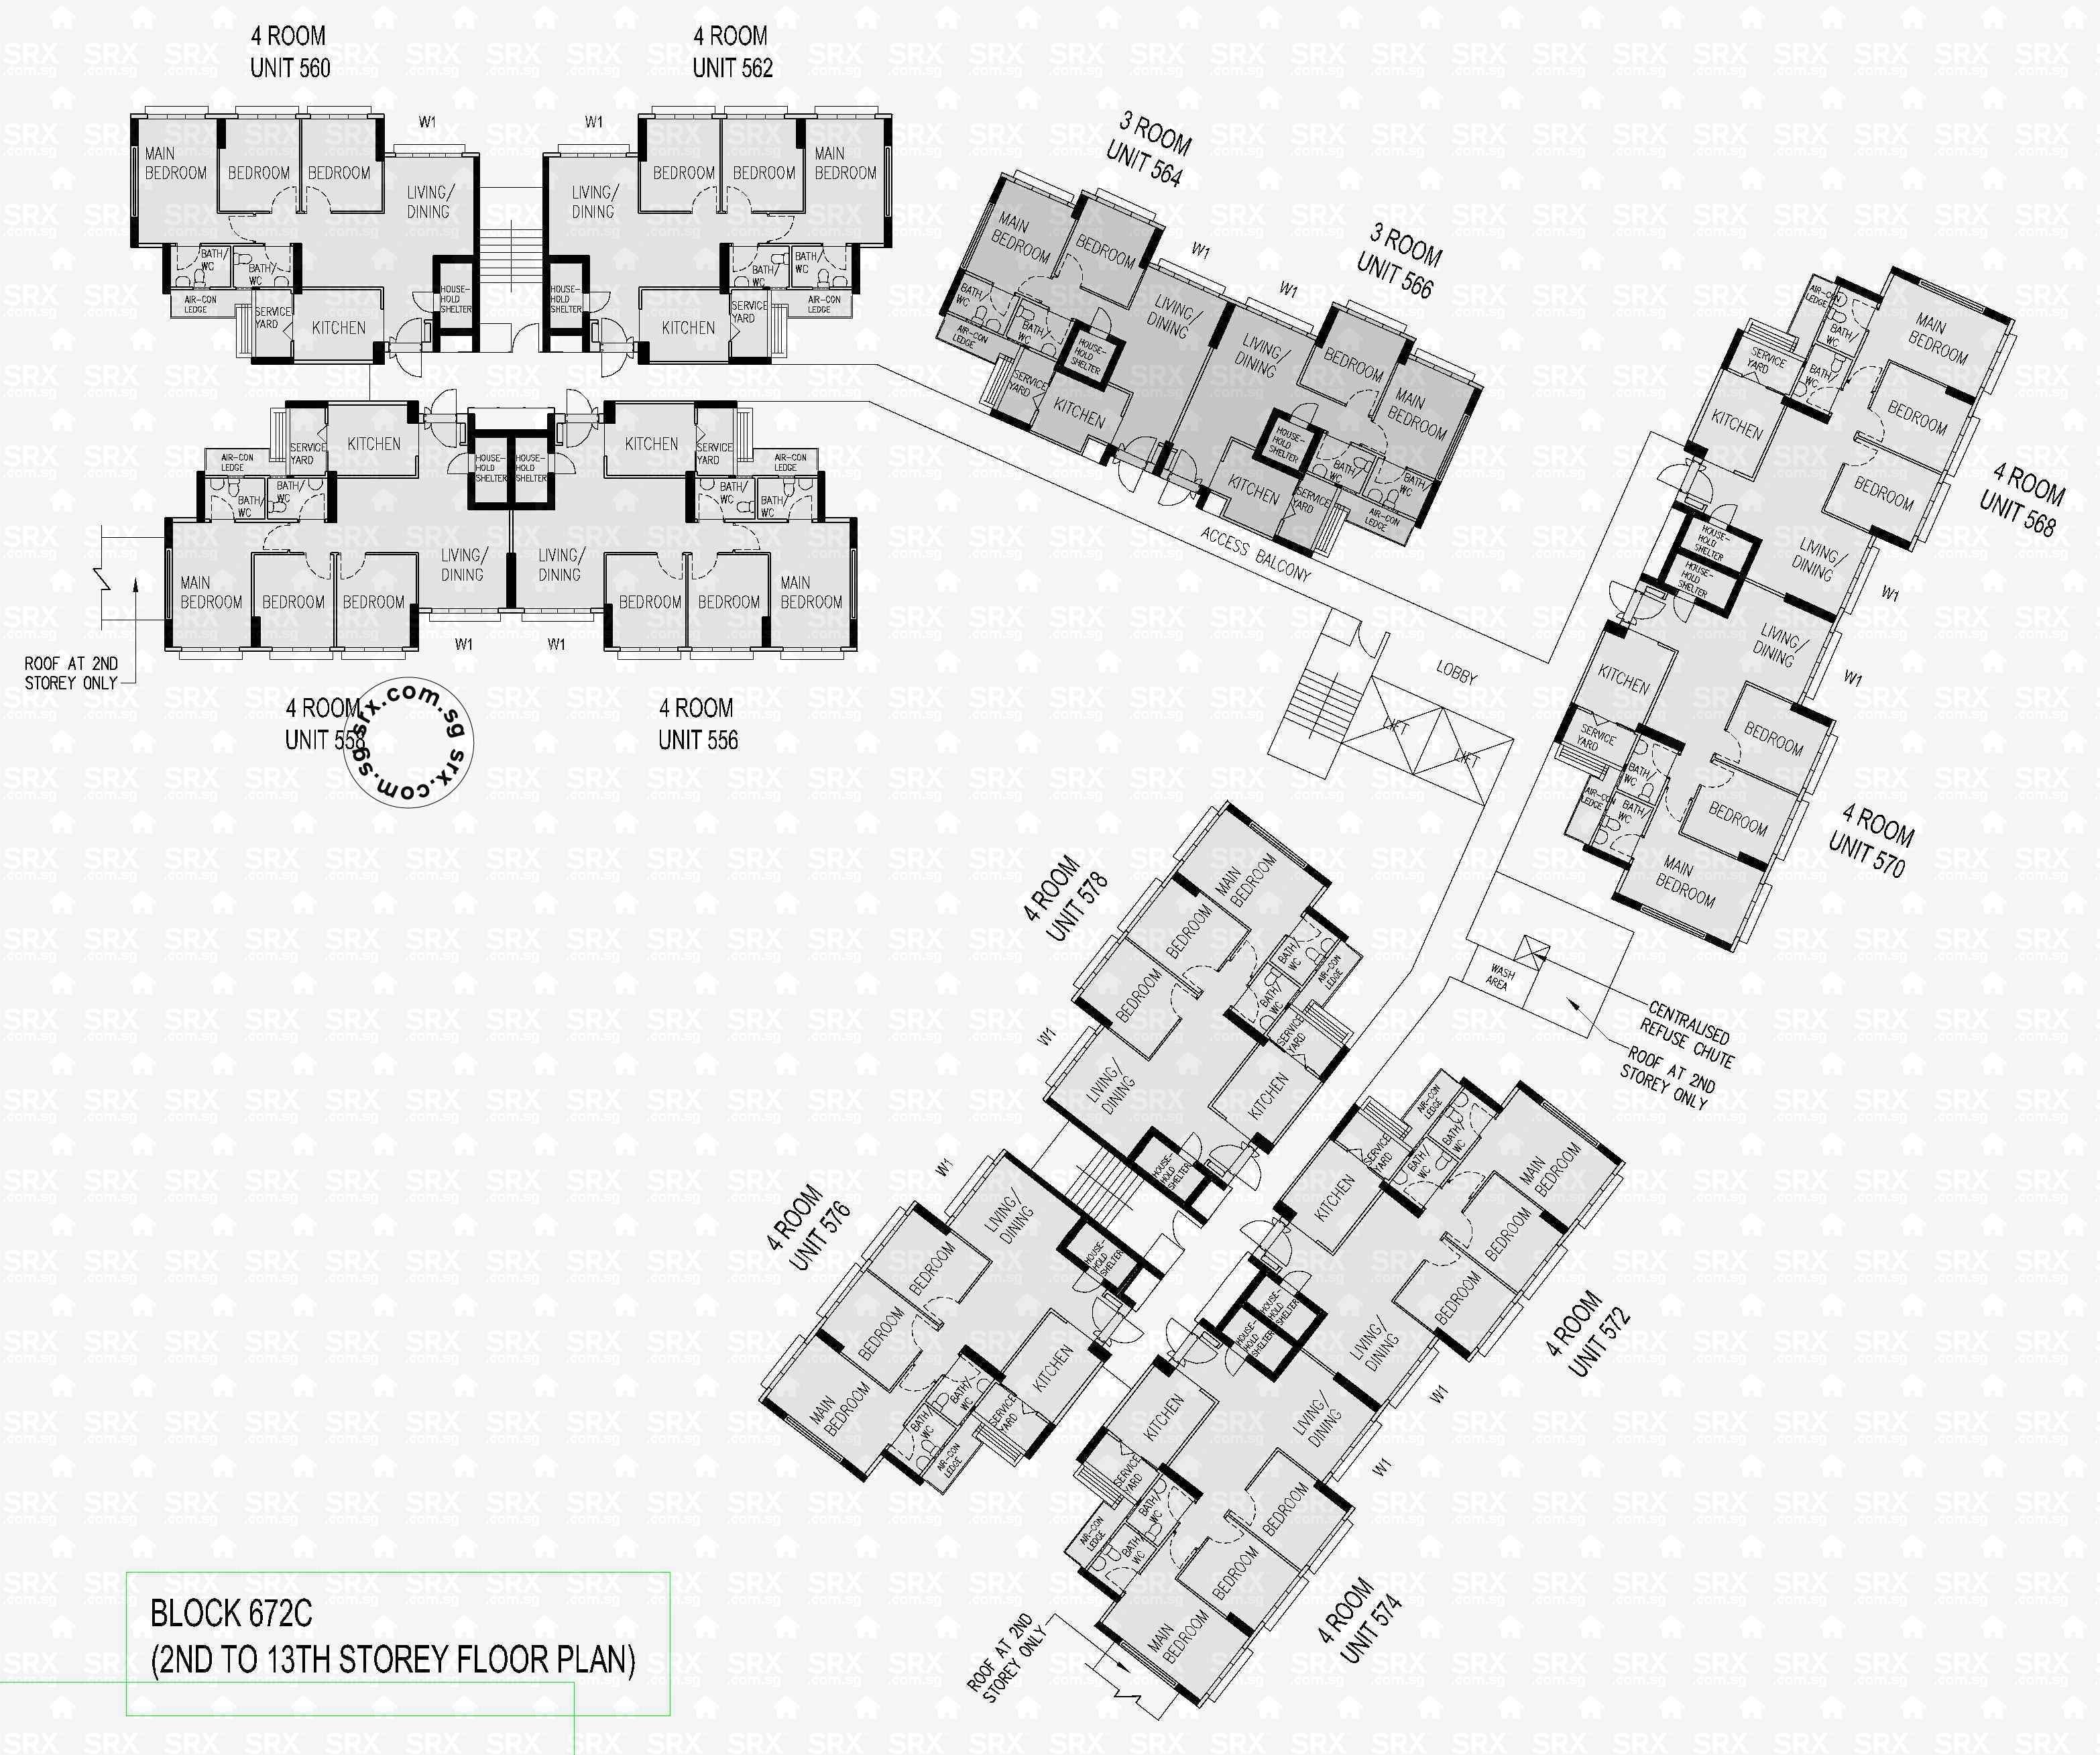 672c Yishun Avenue 4 S 763672 Hdb Details Srx Property